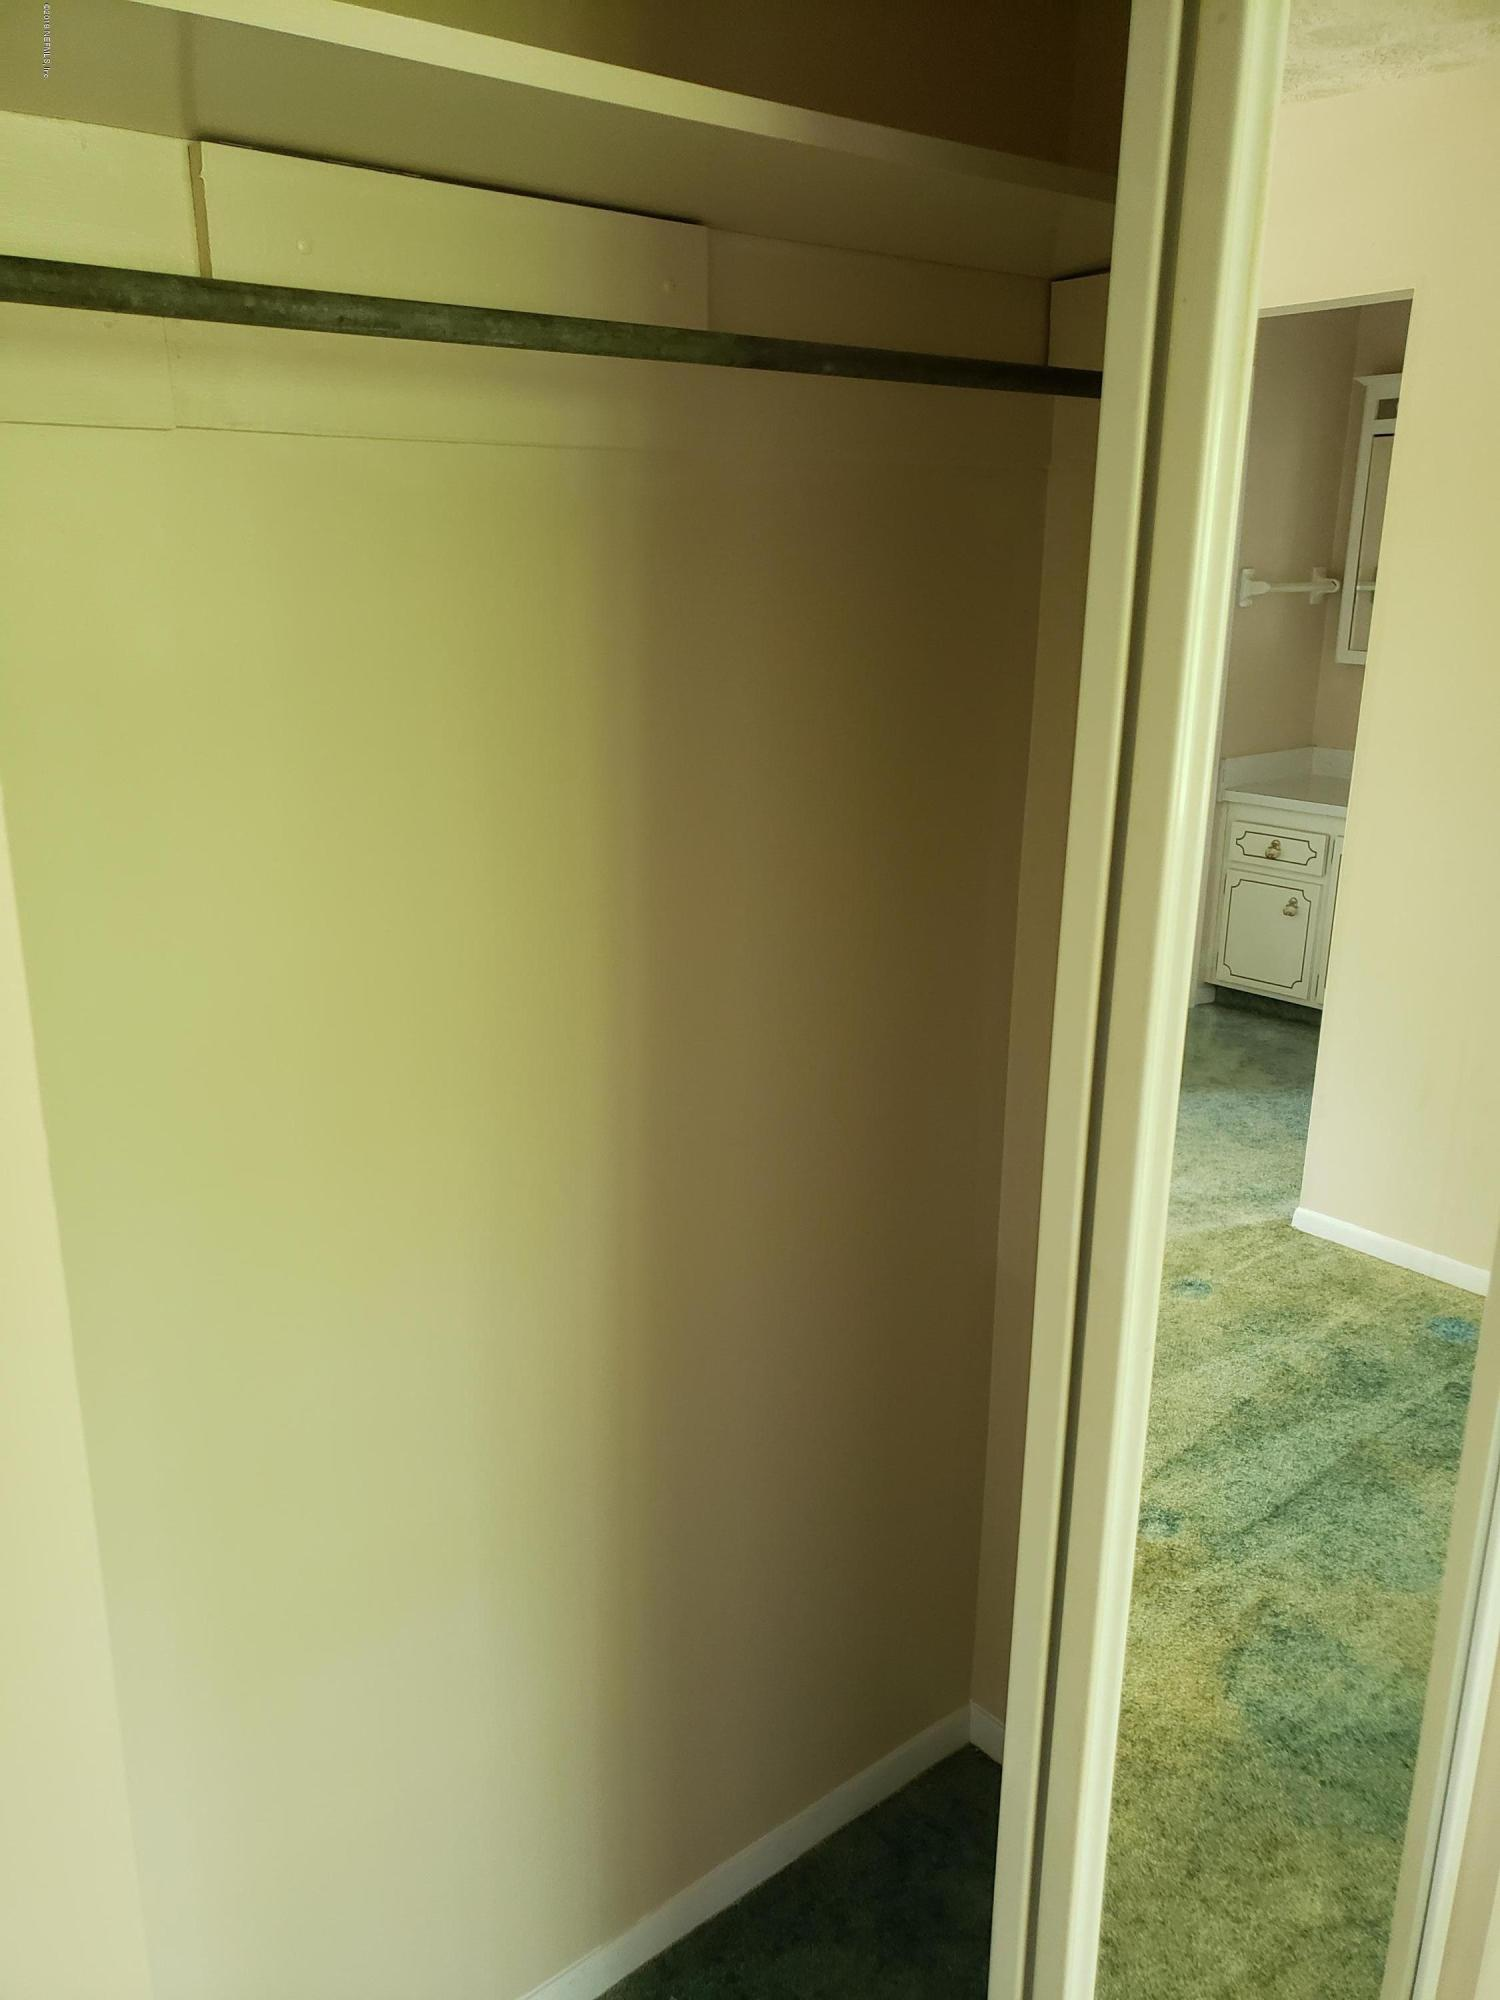 909 LAKE ASBURY, GREEN COVE SPRINGS, FLORIDA 32043, 3 Bedrooms Bedrooms, ,2 BathroomsBathrooms,Residential - single family,For sale,LAKE ASBURY,989204